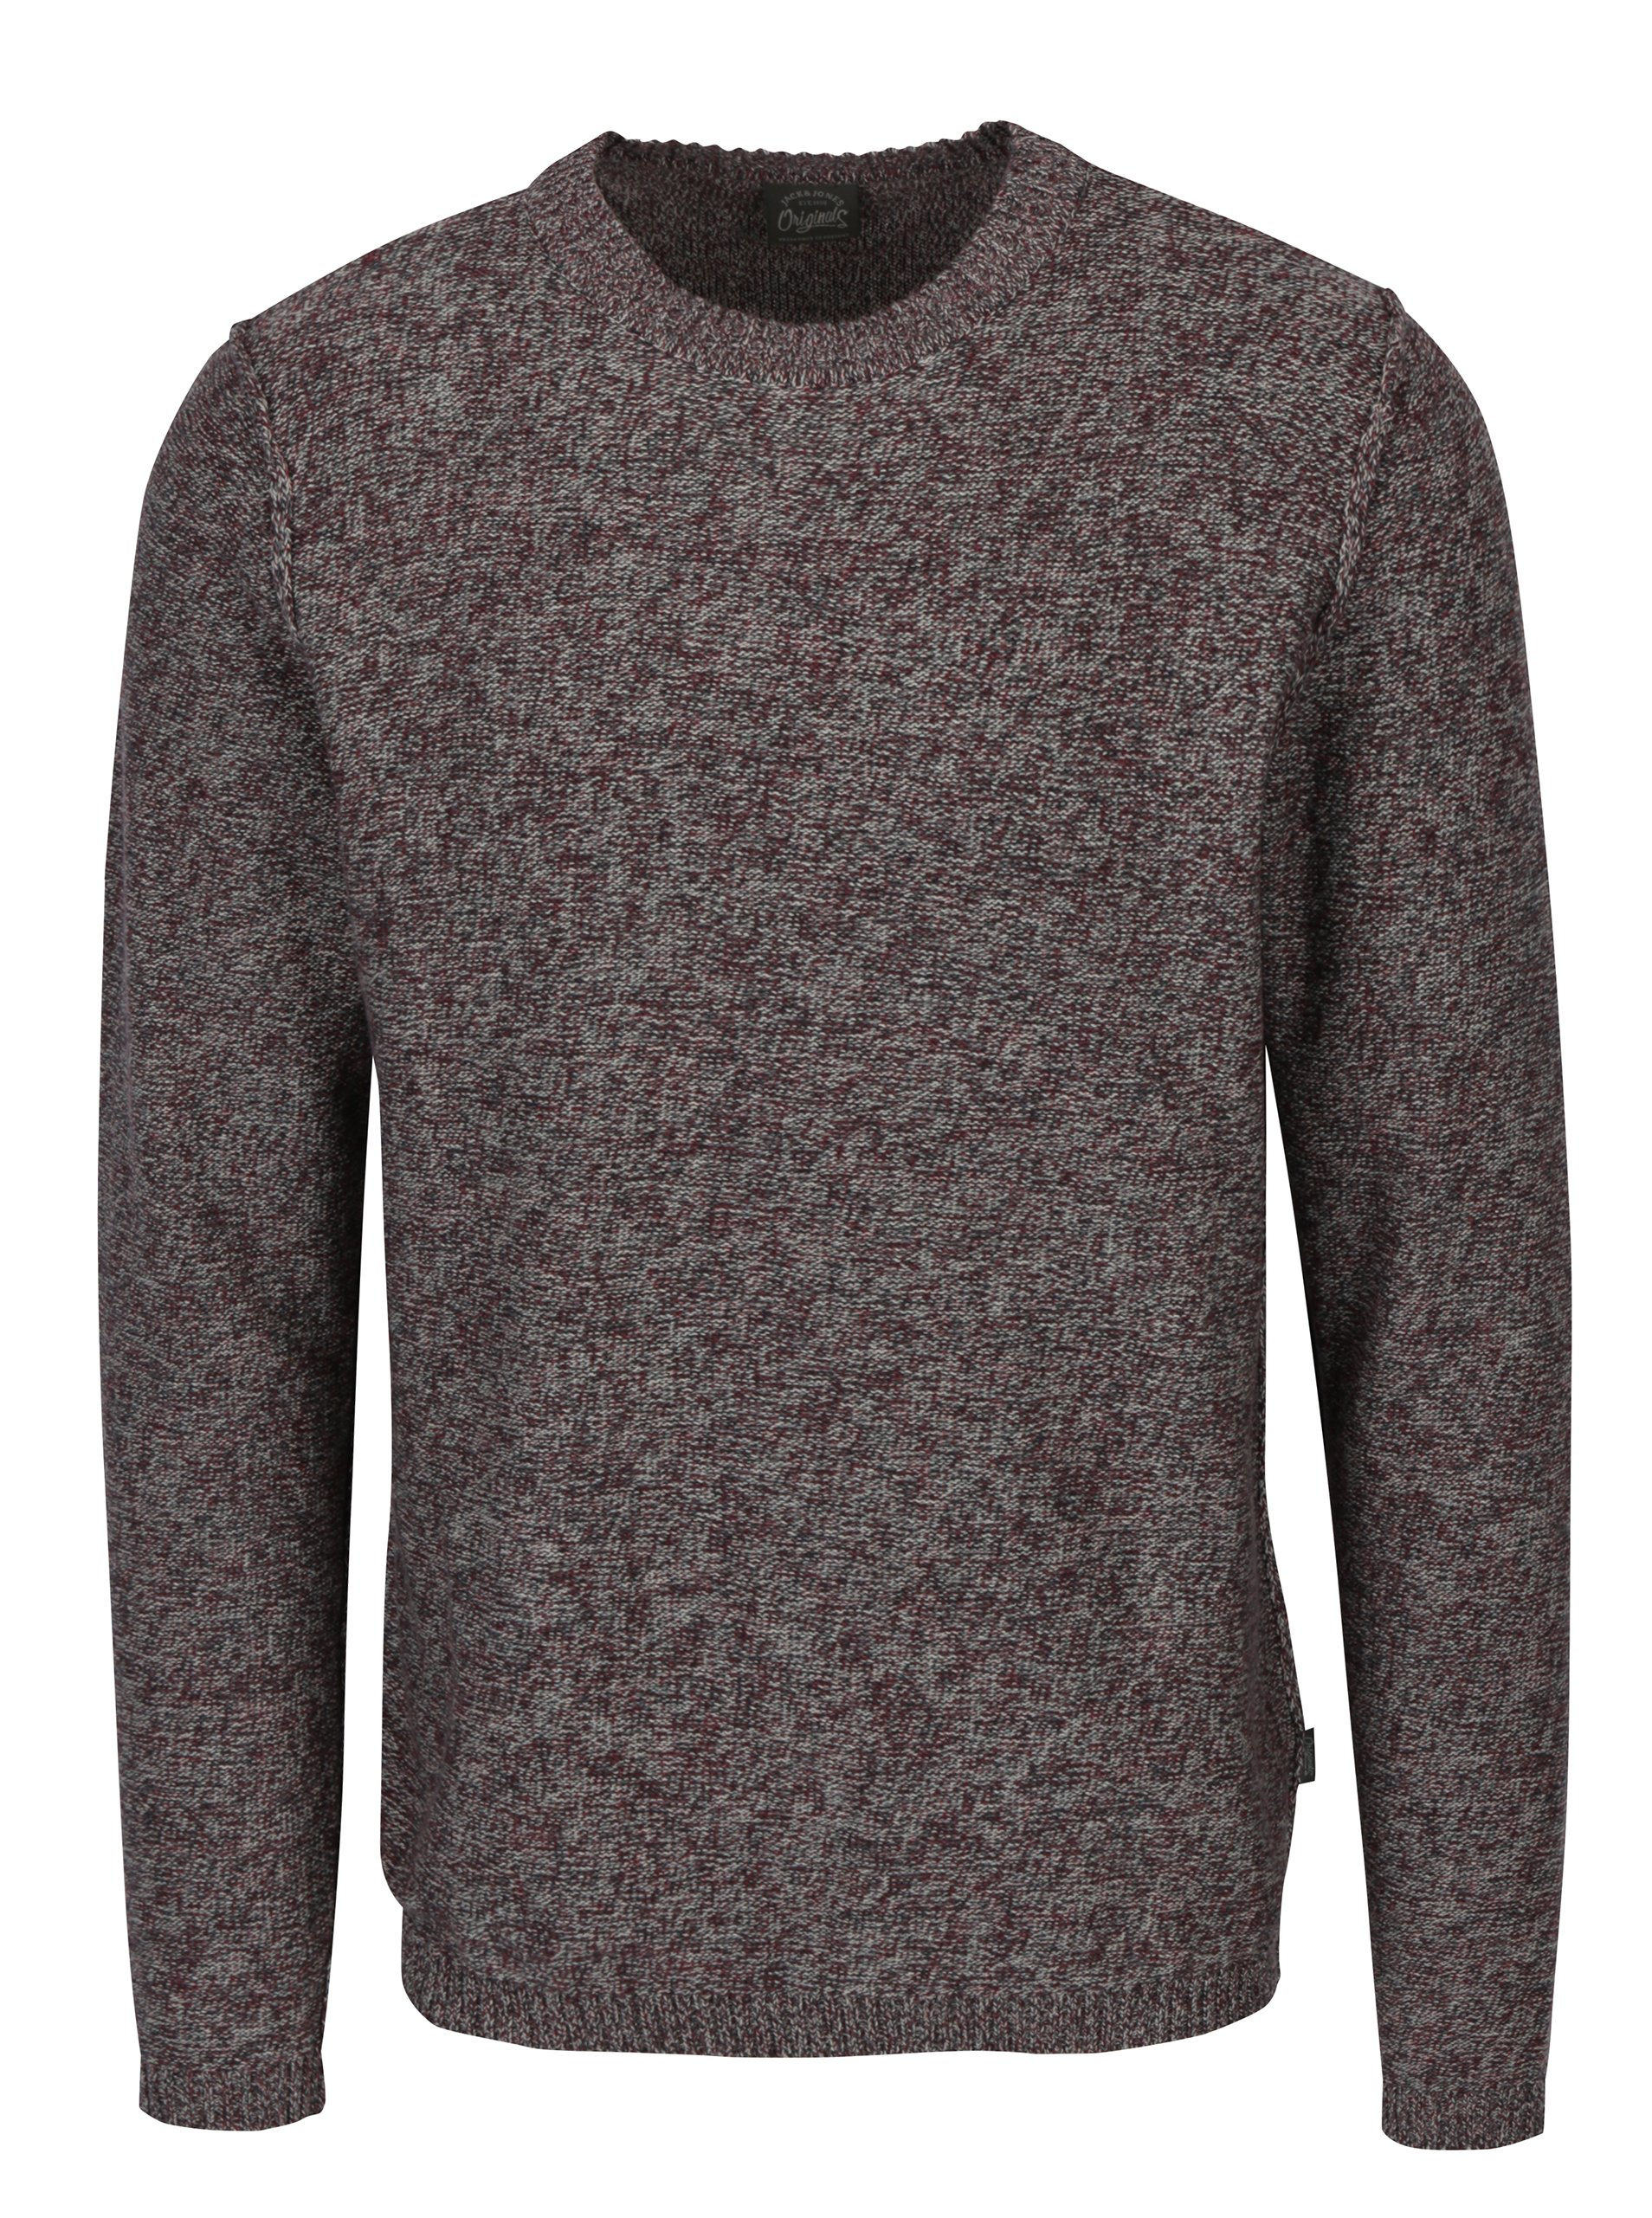 Vínový melírovaný sveter Jack & Jones Originals Uber